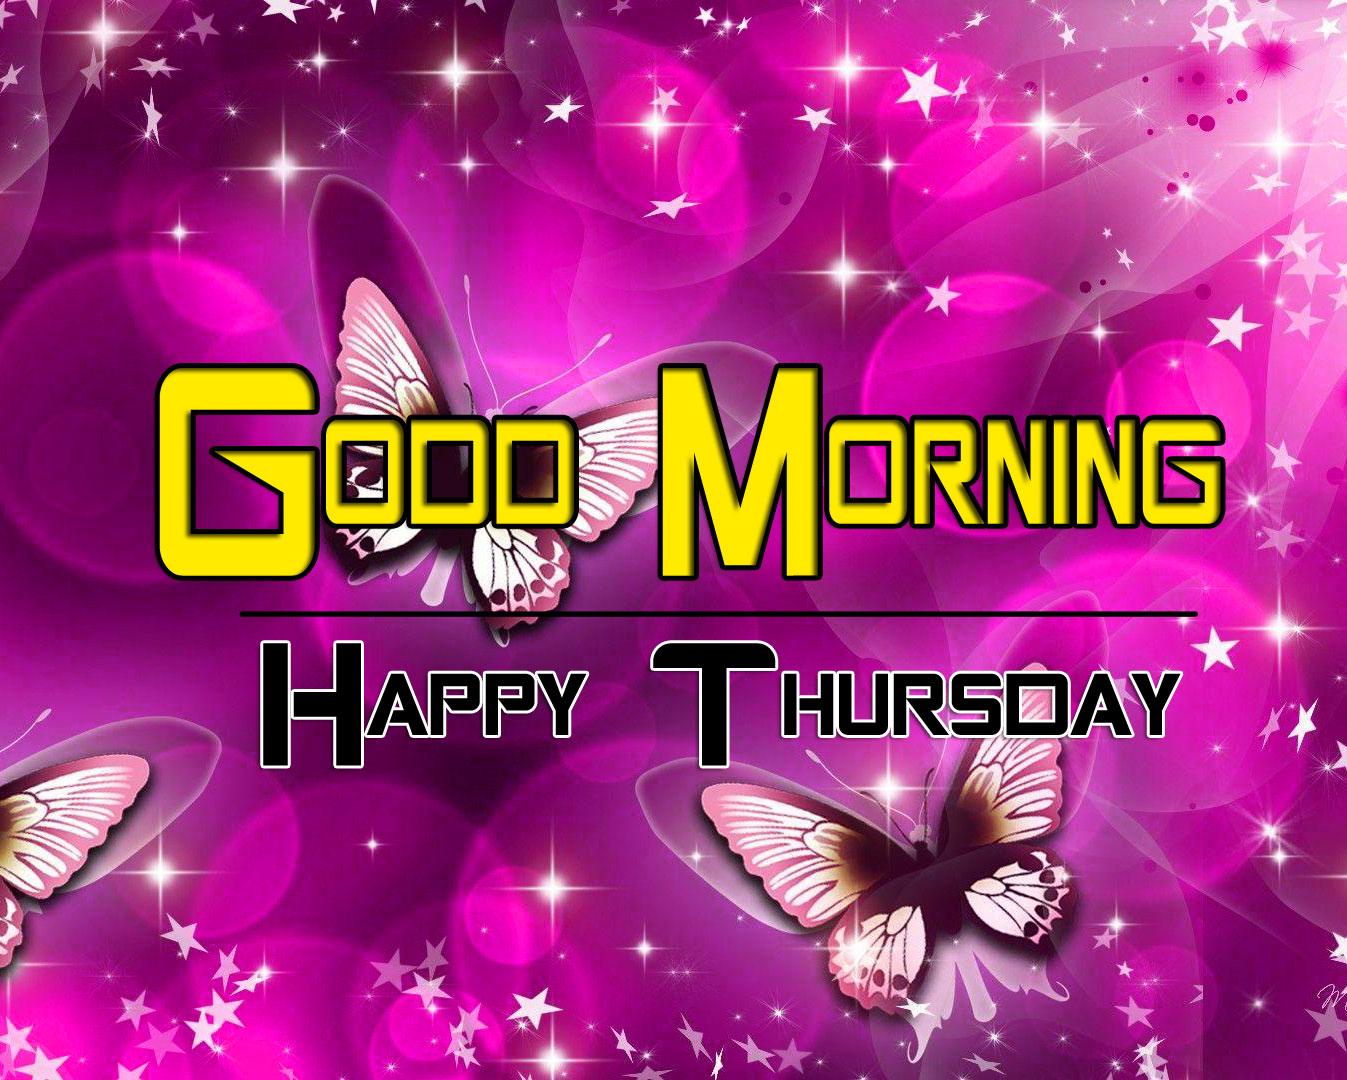 thursday morning Pics Download 3